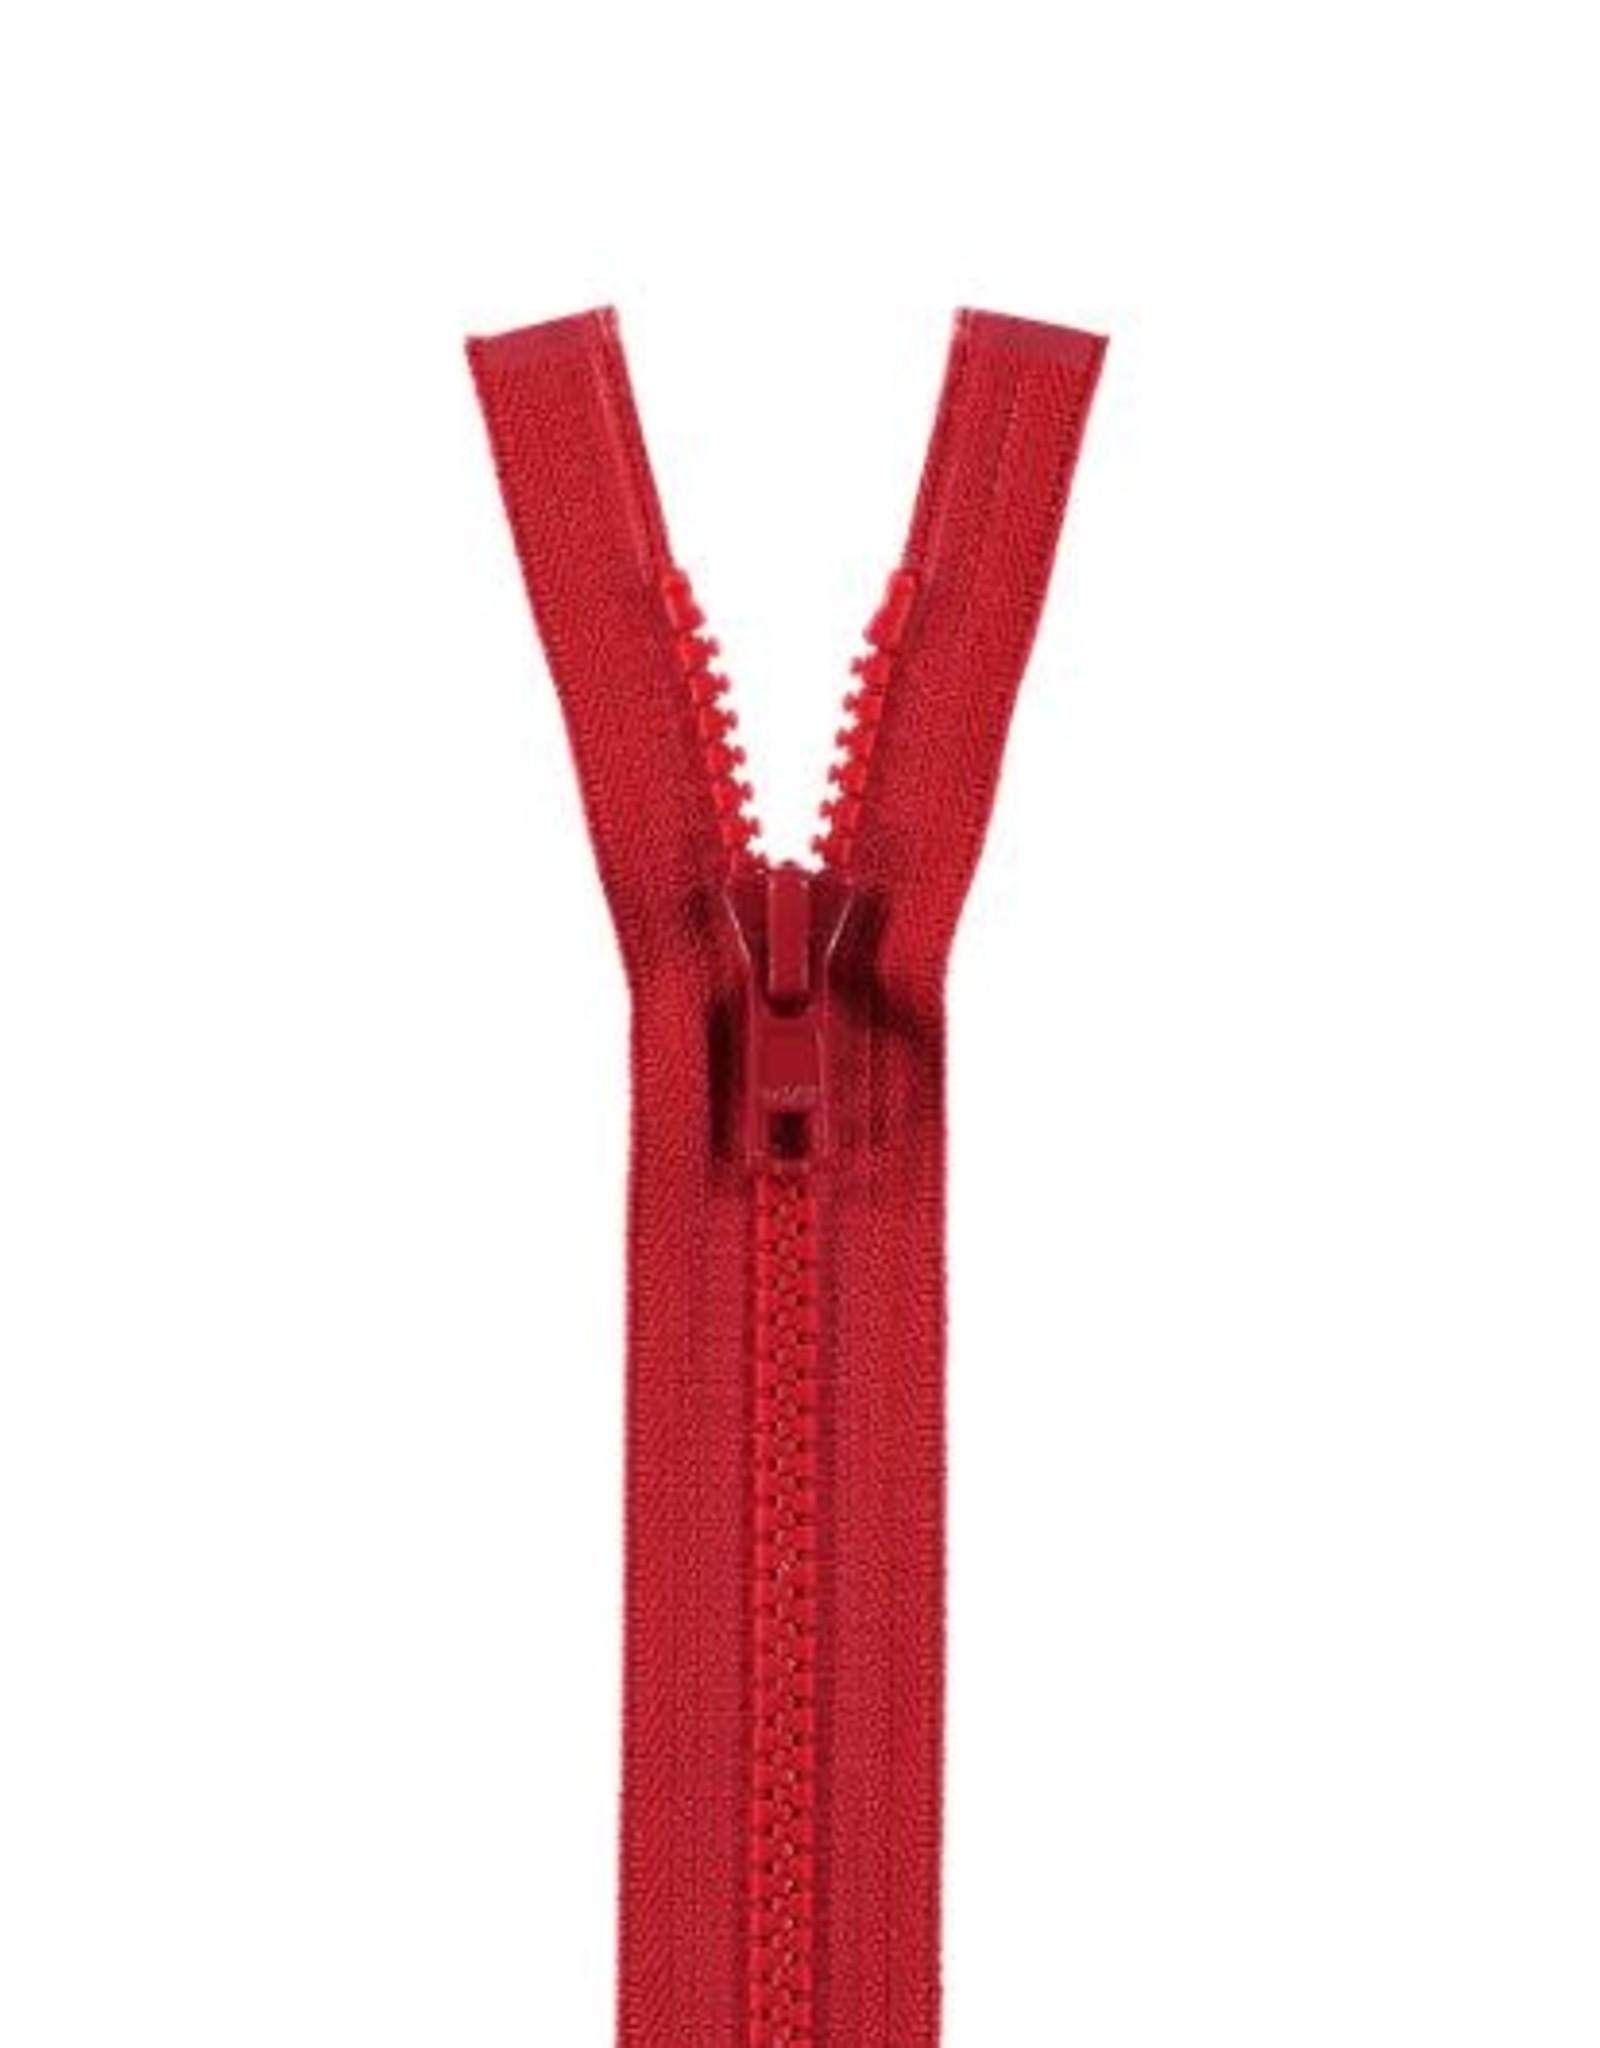 YKK BLOKRITS 5 DEELBAAR rood 519-35cm